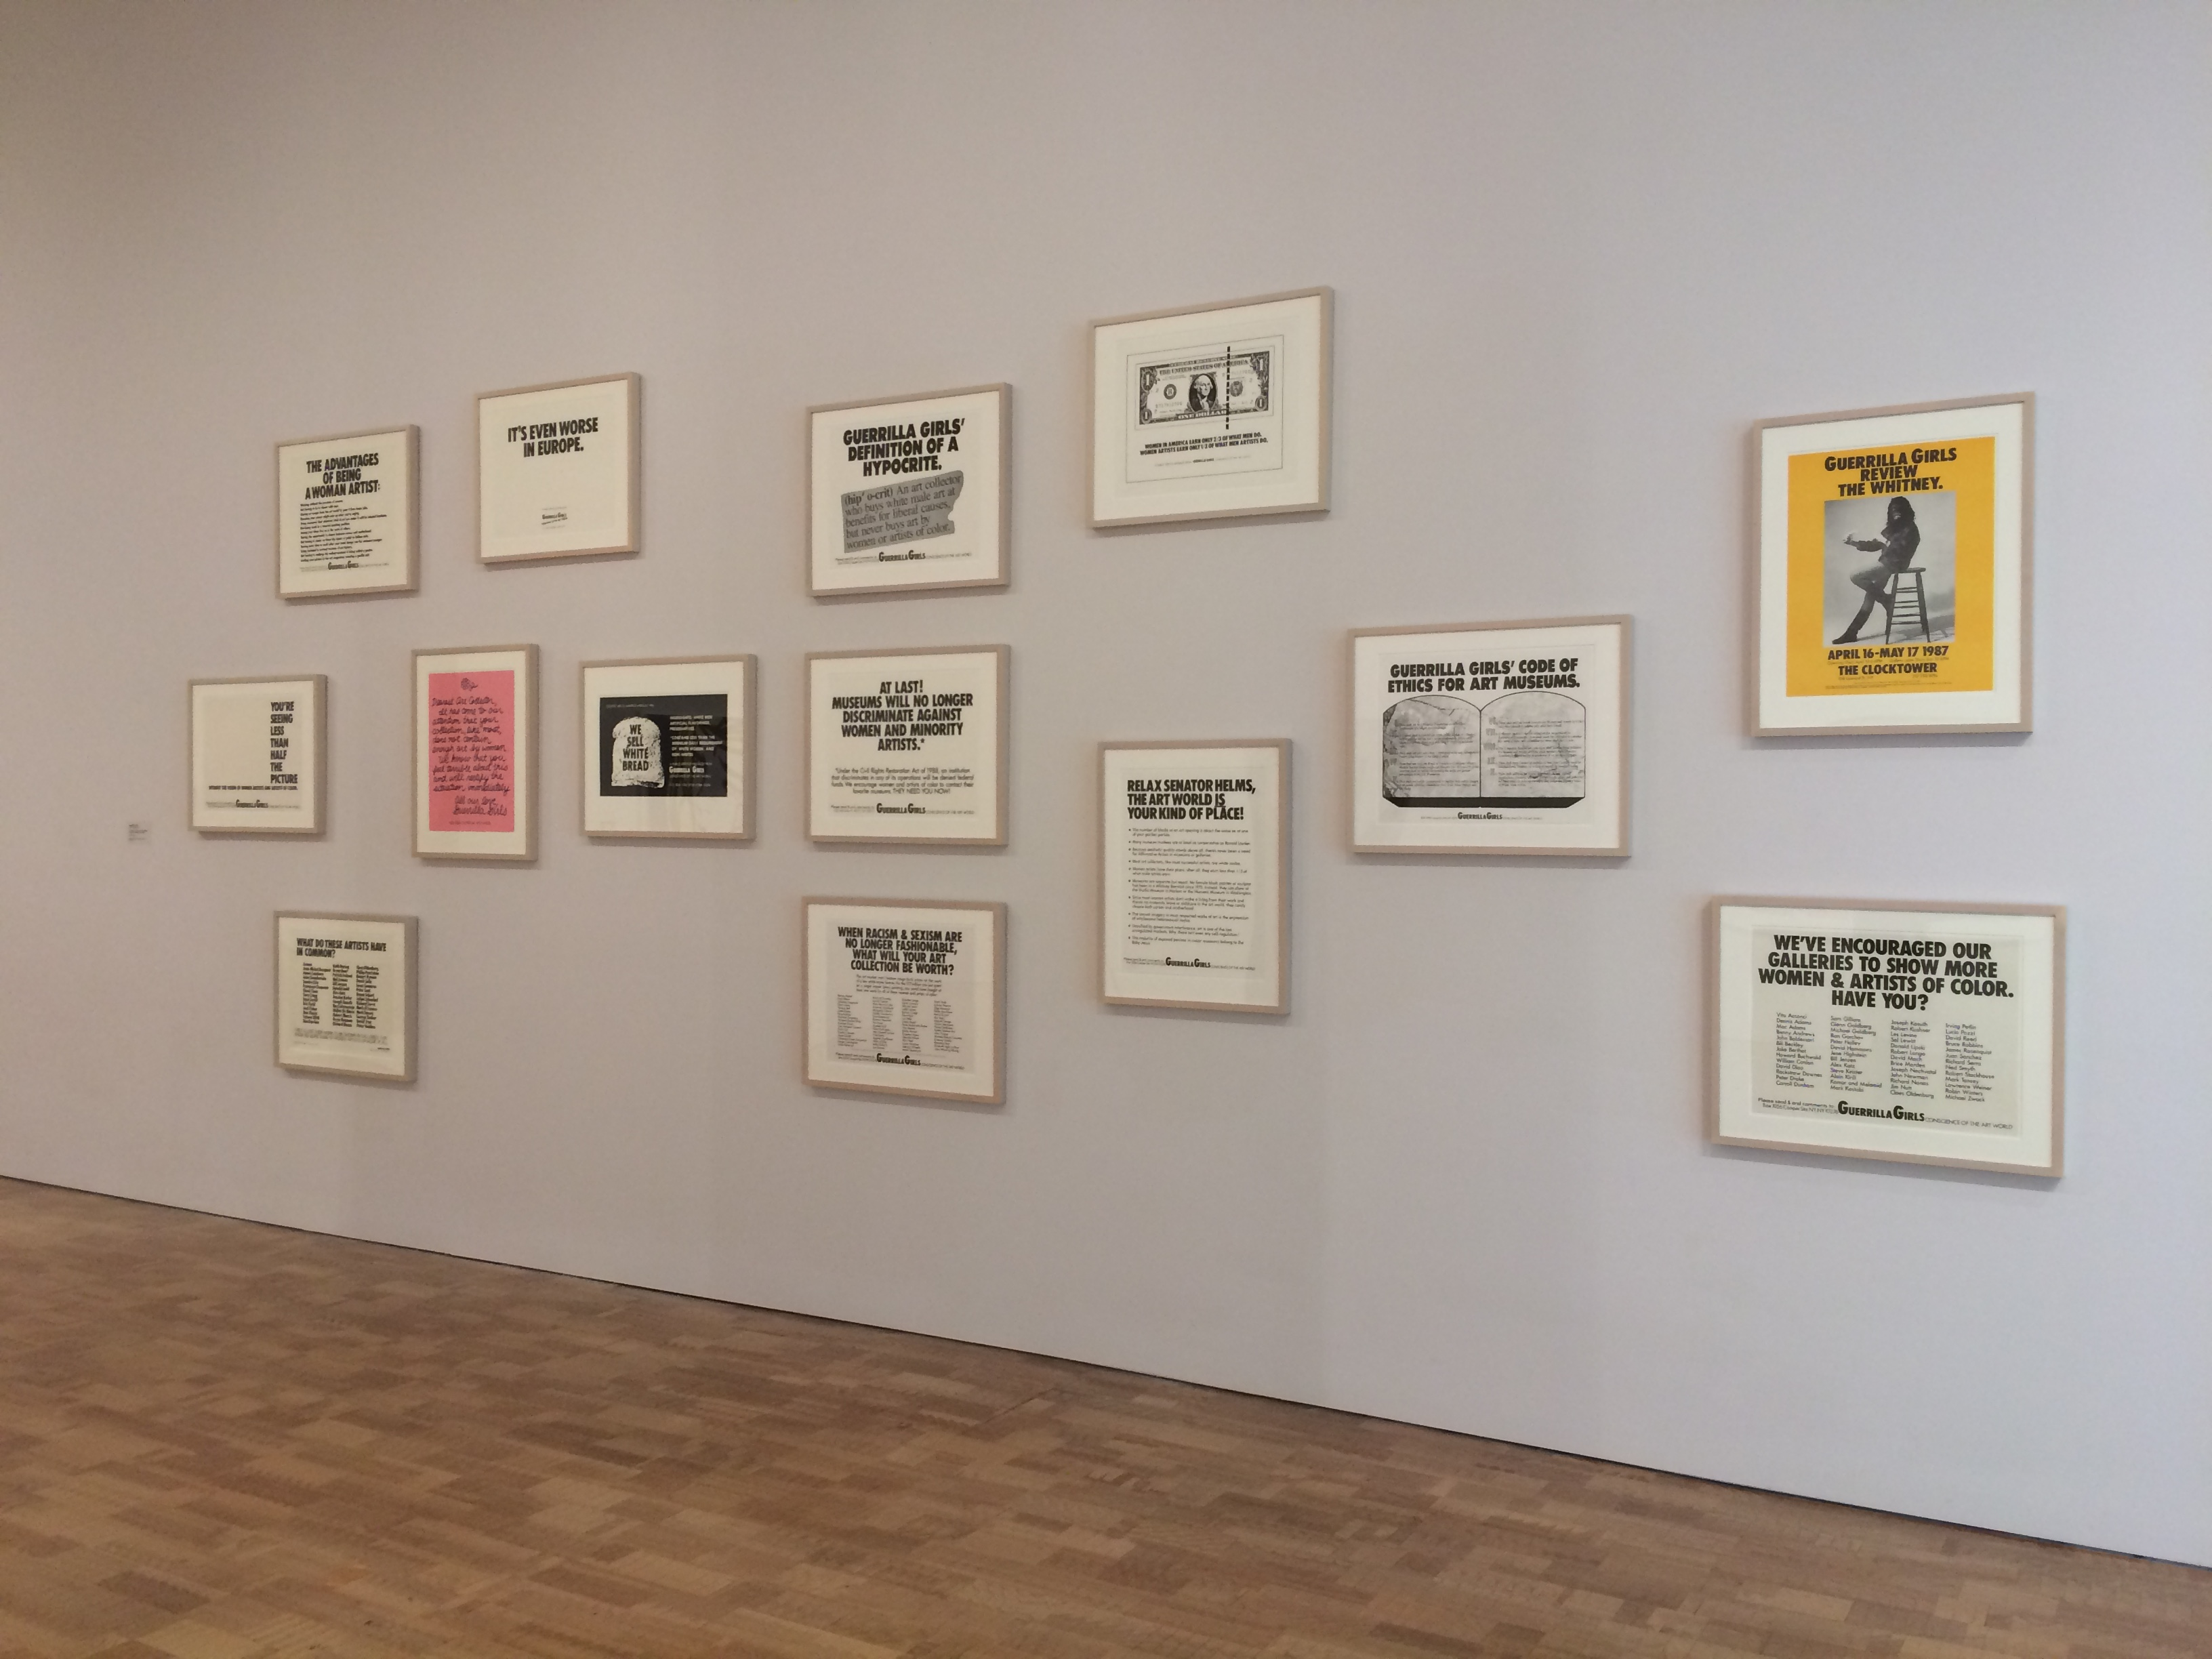 Installation of Guerrilla Girls prints at the Milwaukee Art Museum. Photo credit: Tina Schinabeck.